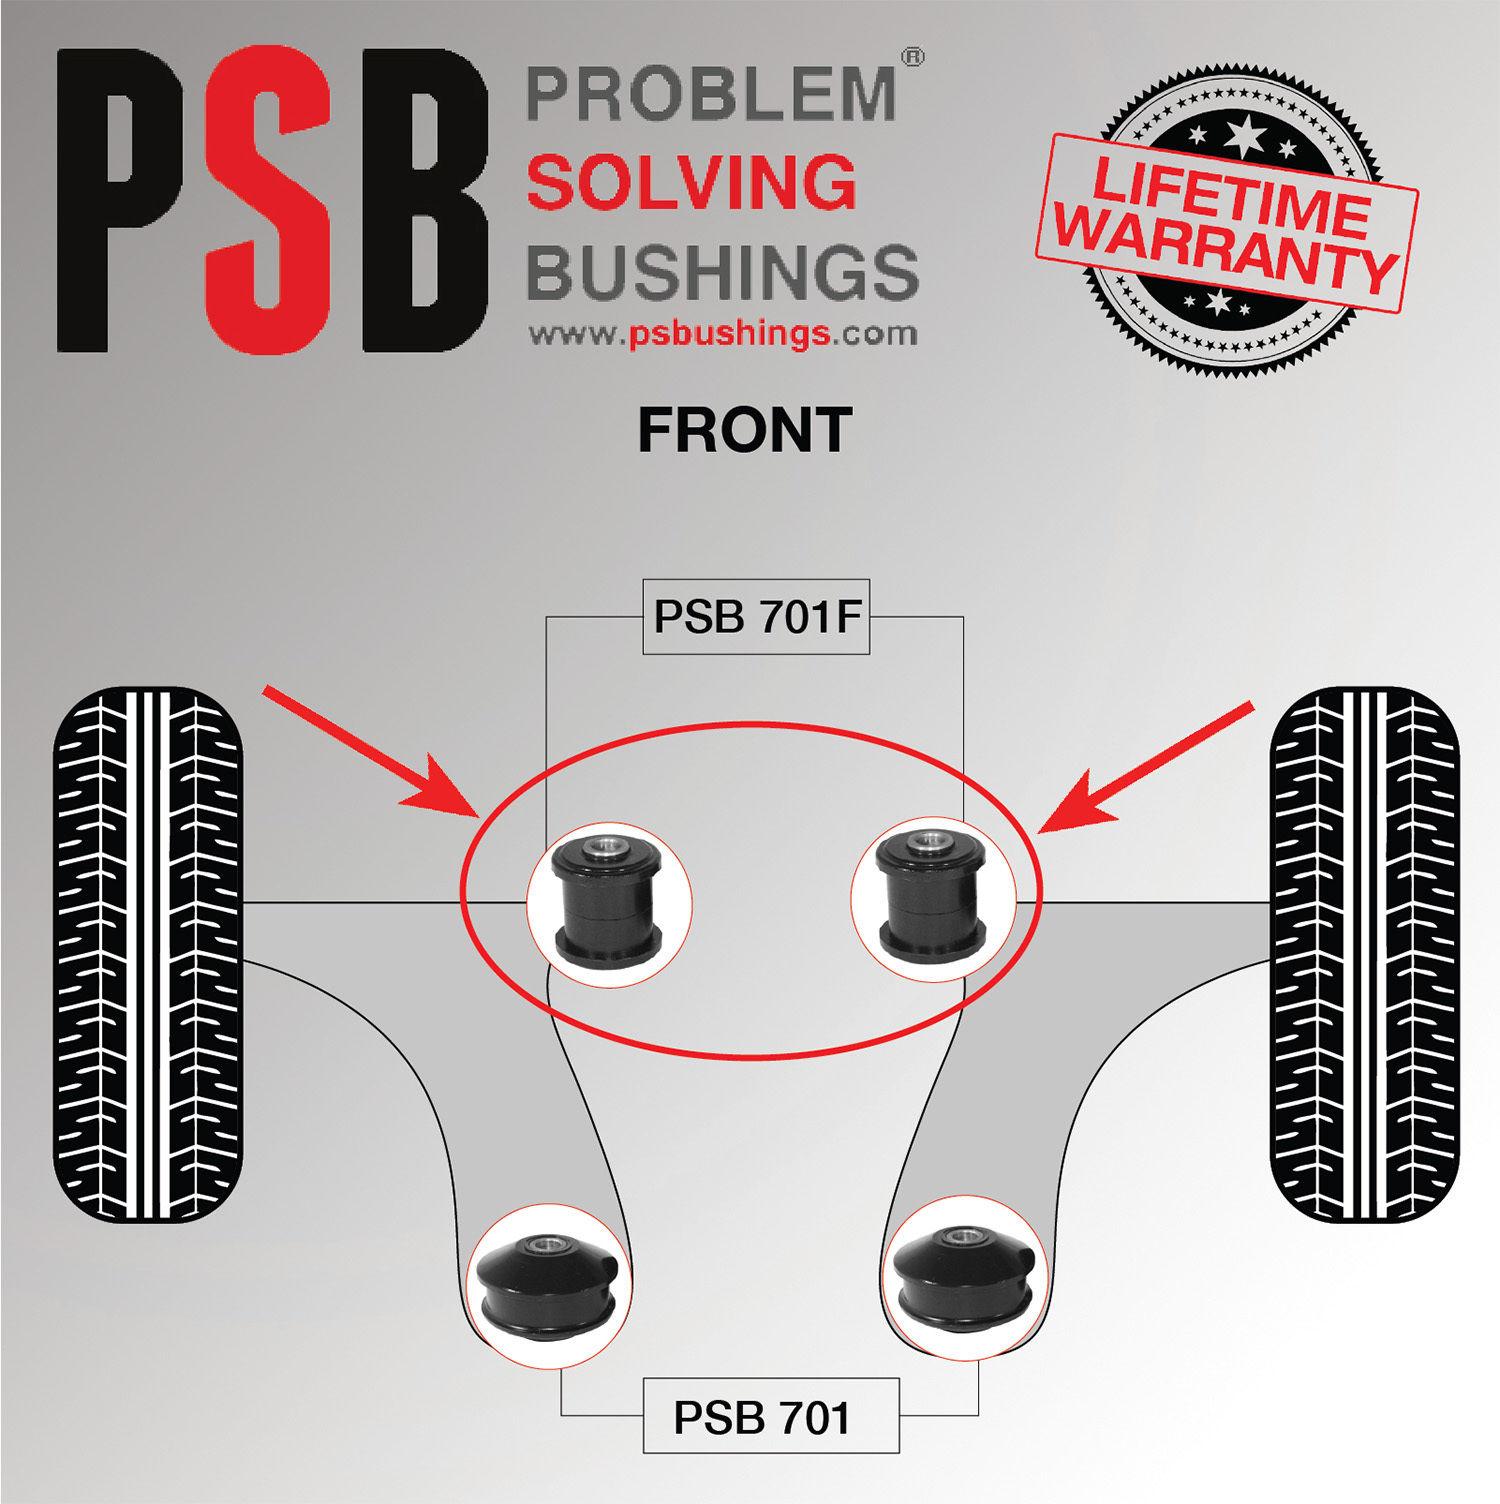 2 x VW Passat B8 Polyurethane PSB Front Lower Arm Front Bushing 2015 - 2017